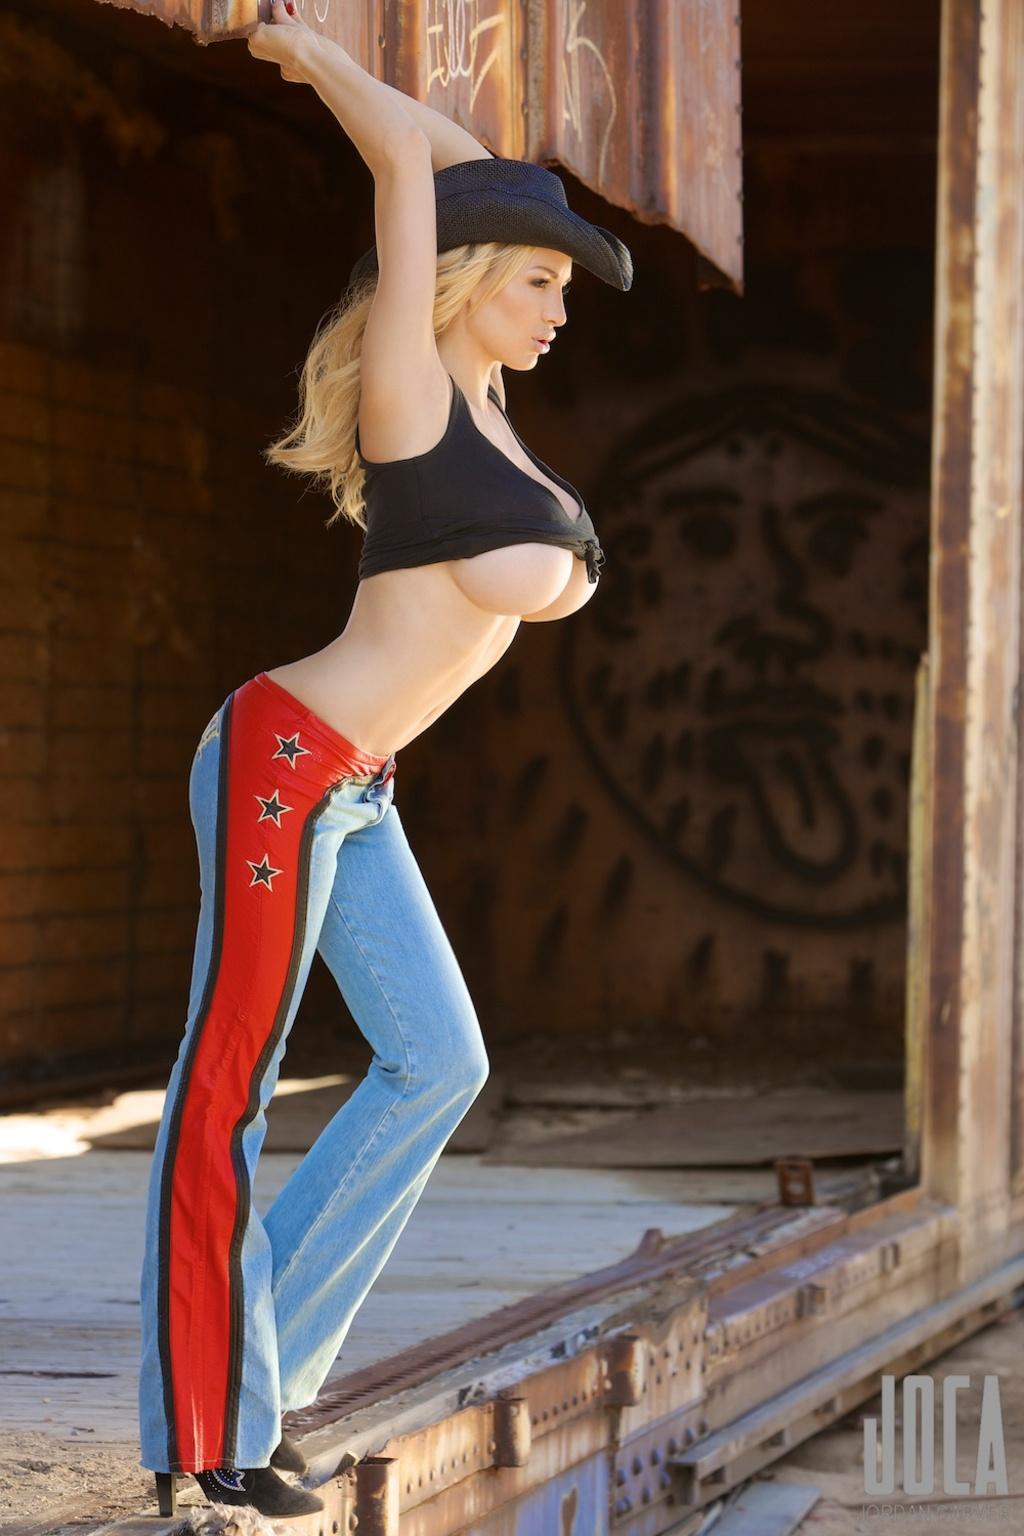 Jordan Carver - The Cow Girl - BIG BOOBS JORDAN CARVER